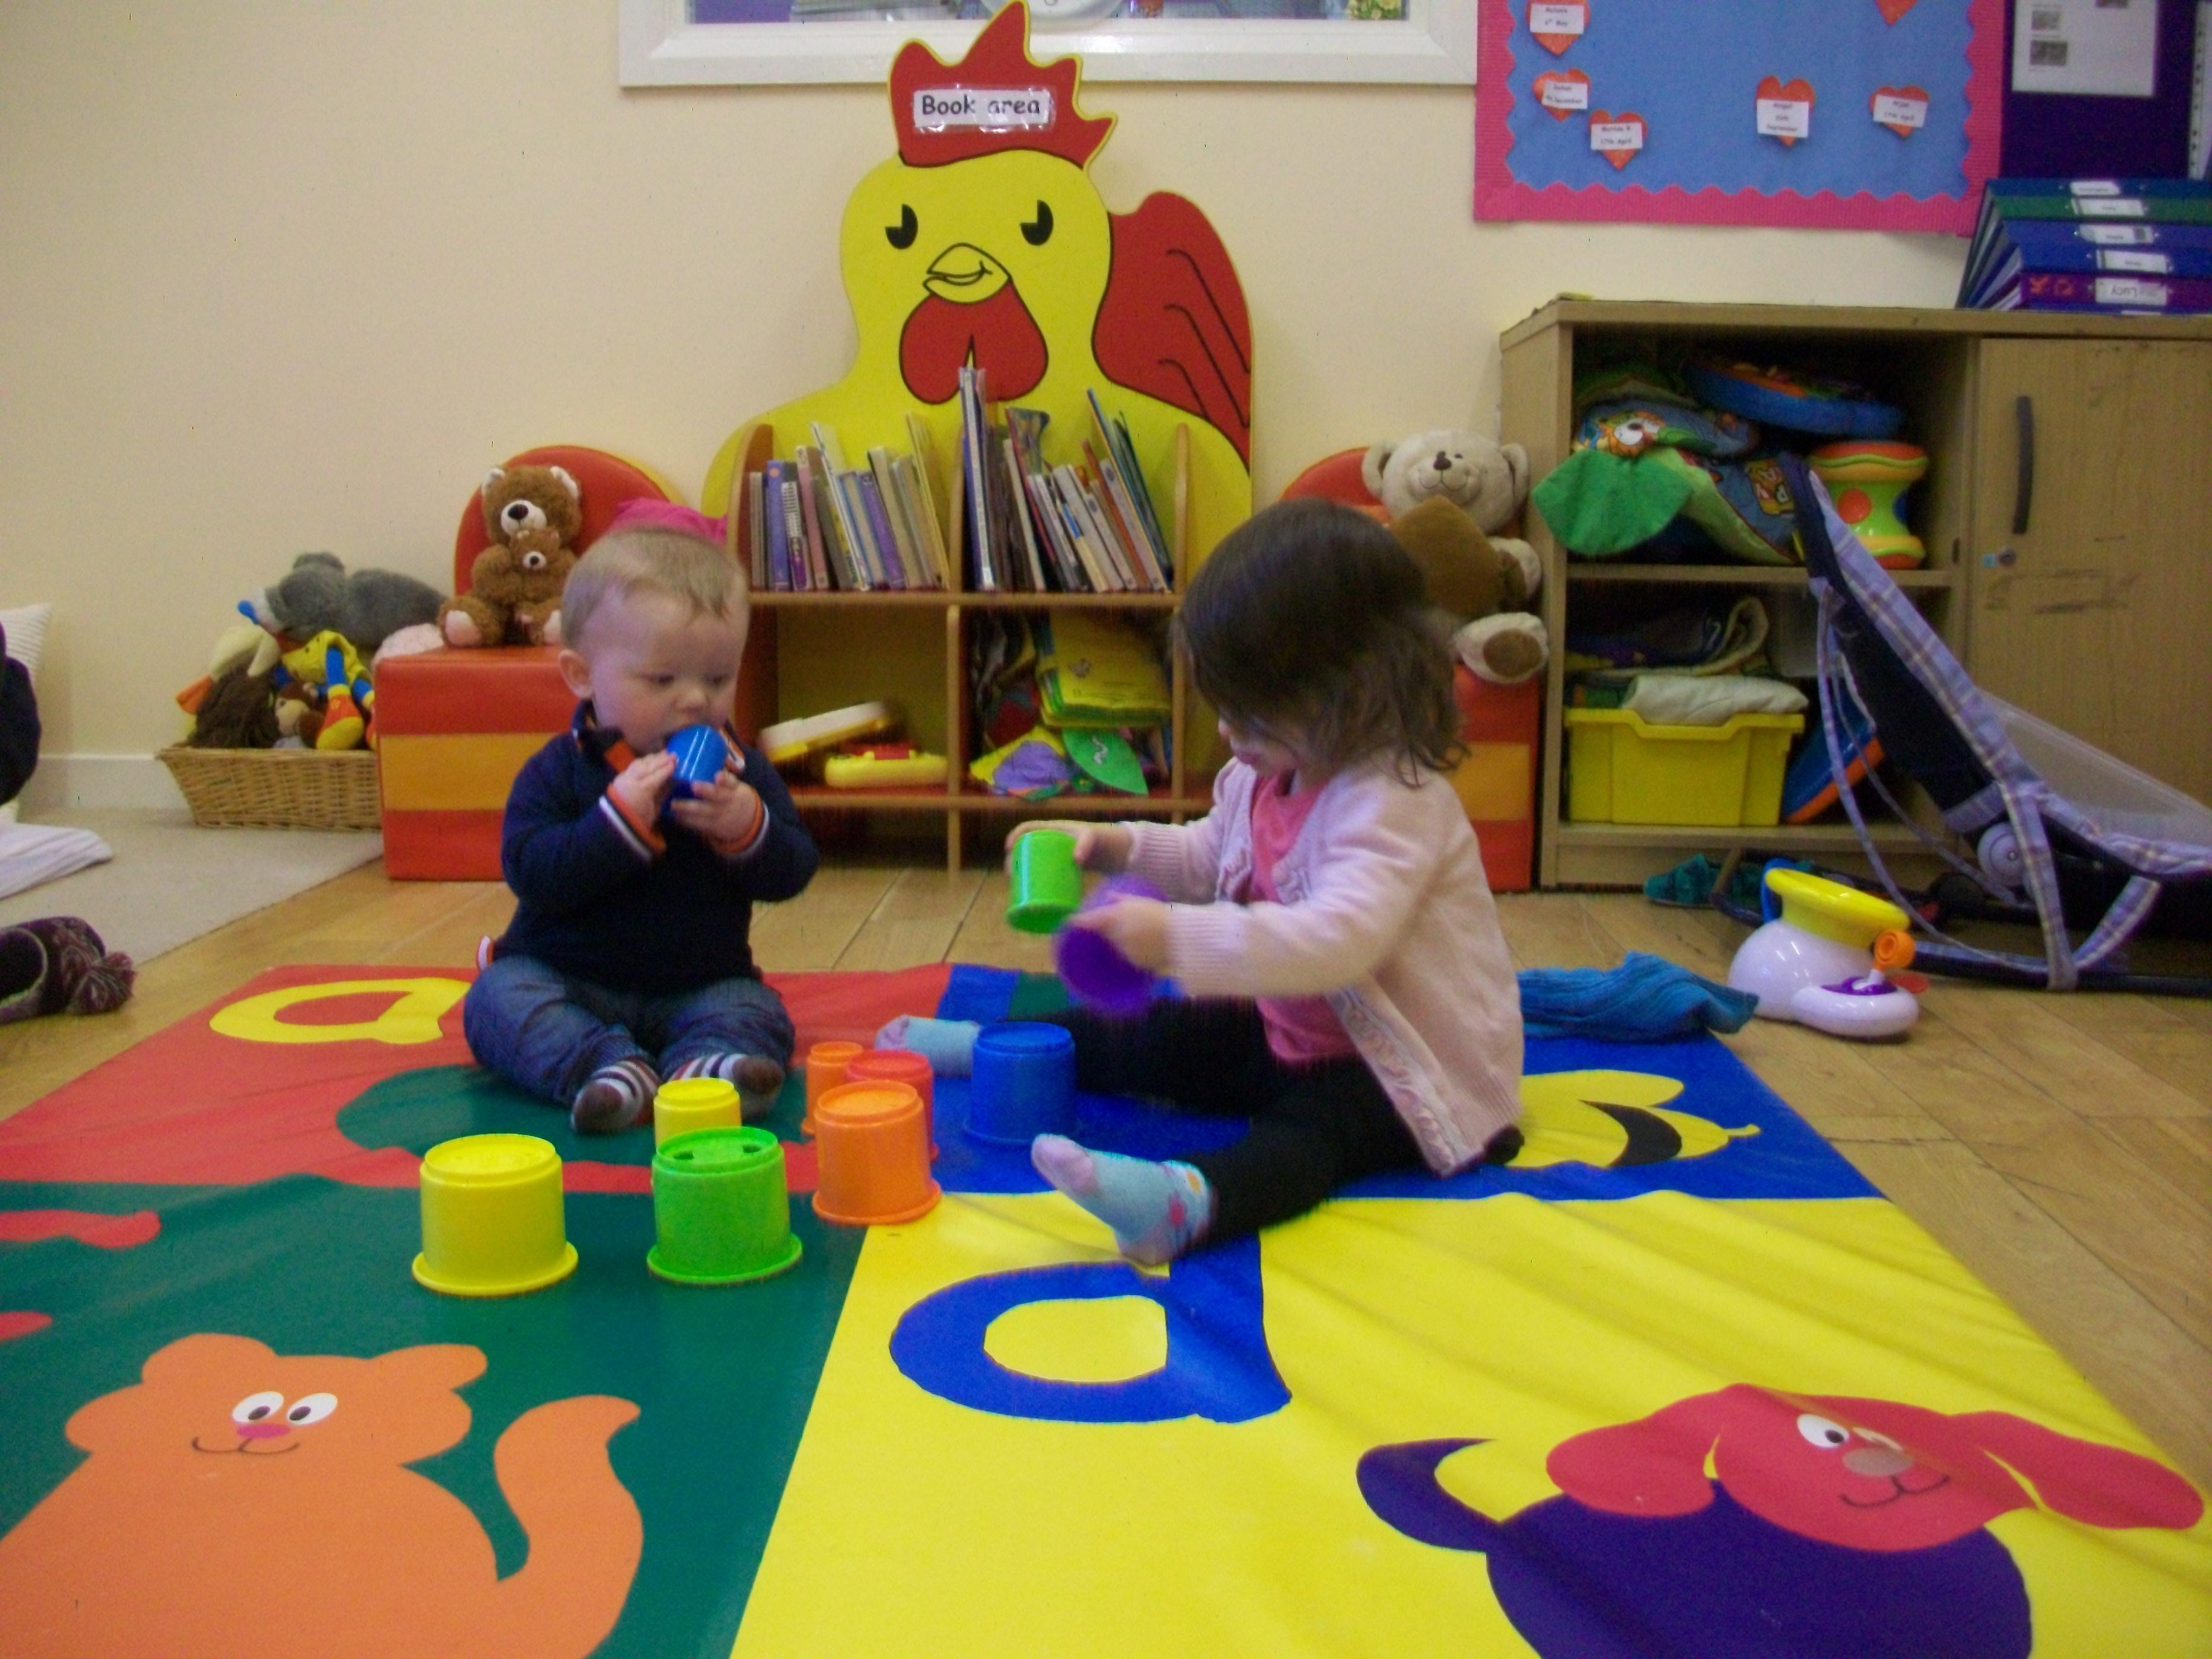 Baby Room Footprints Day Nursery